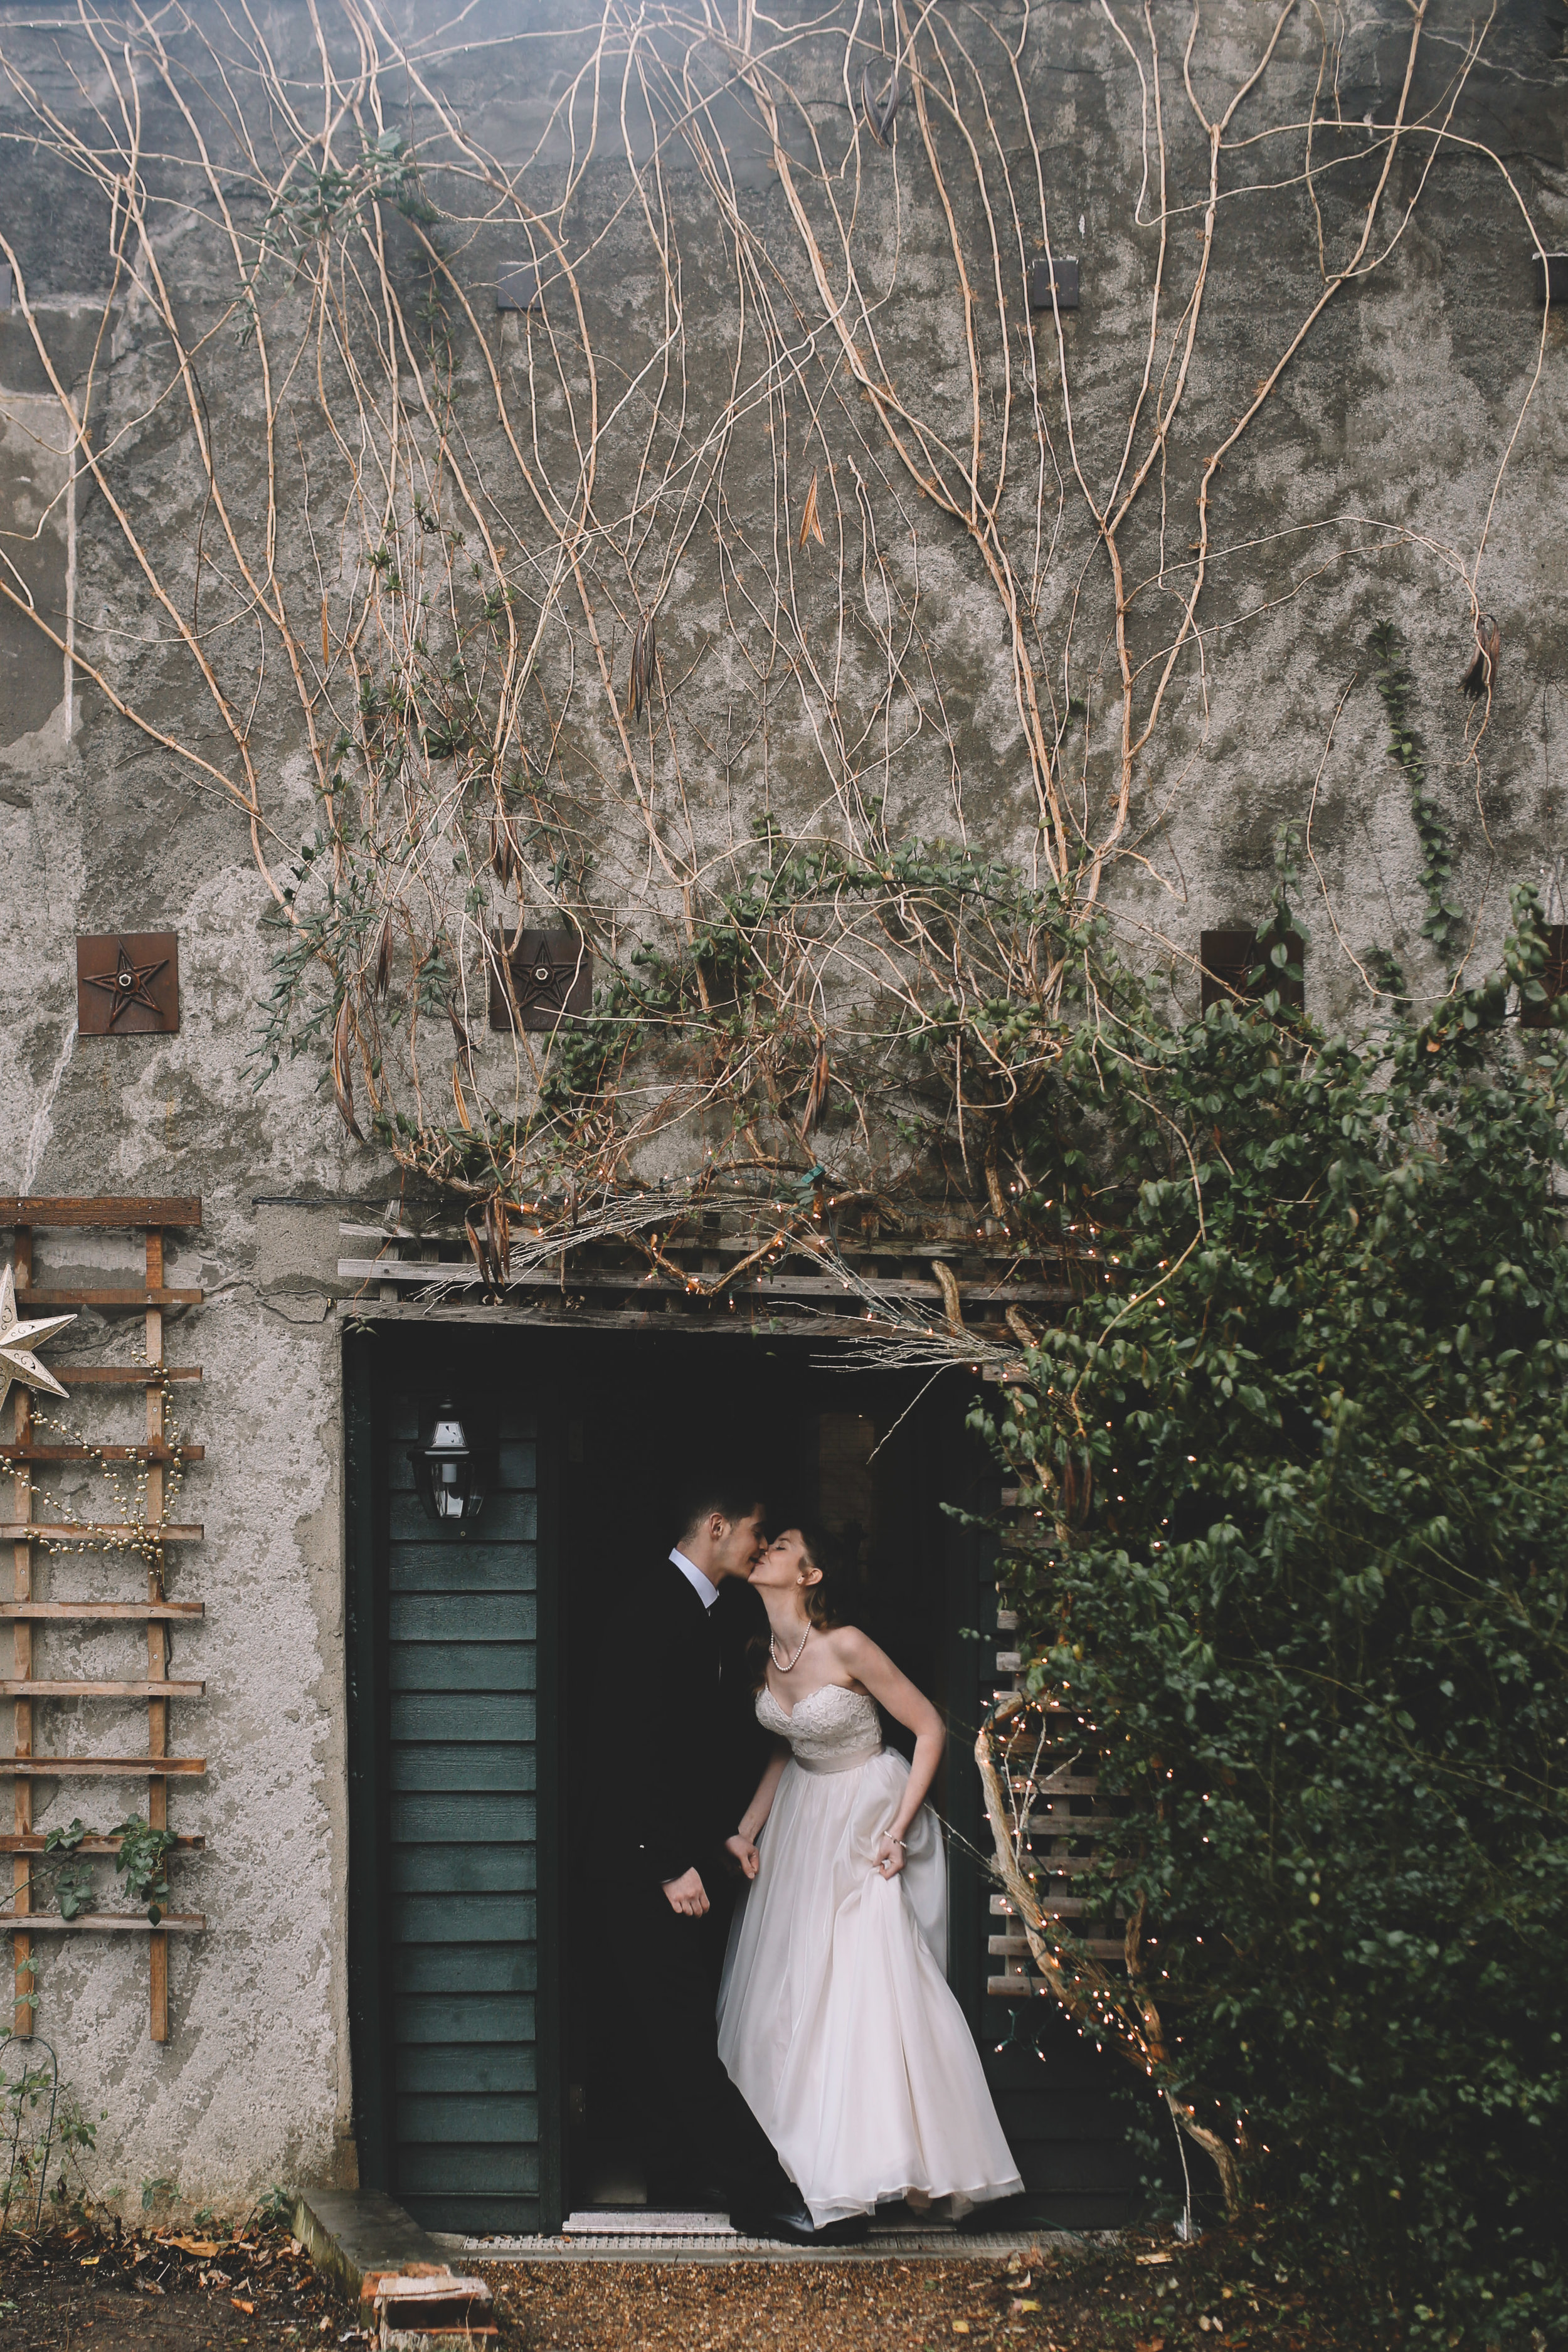 Jake + Brittney Balbas Airbnb Carriage House Wedding Evansville IN (90 of 426).jpg